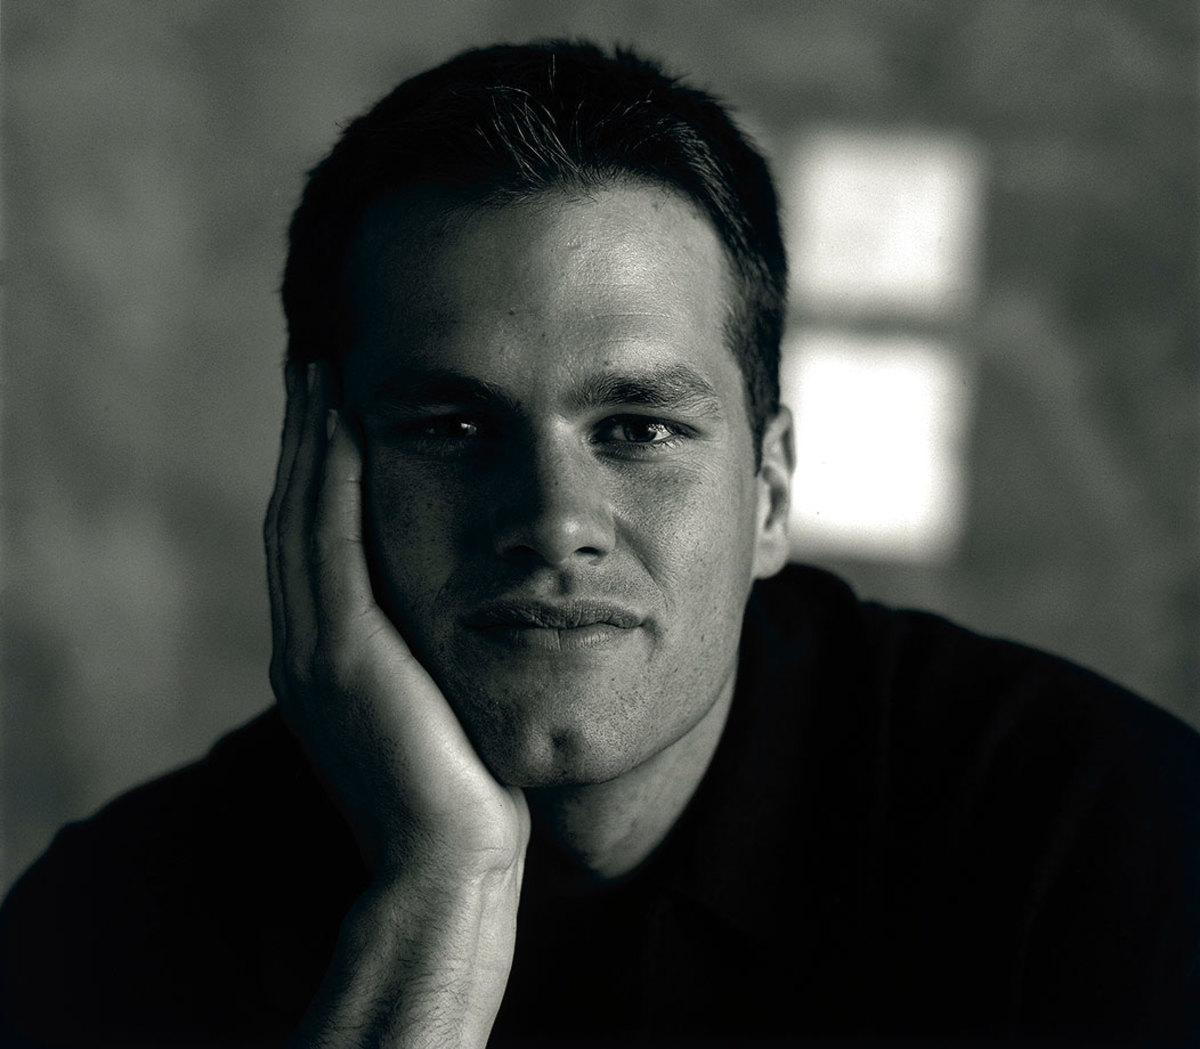 2002-Tom-Brady-001250208.jpg